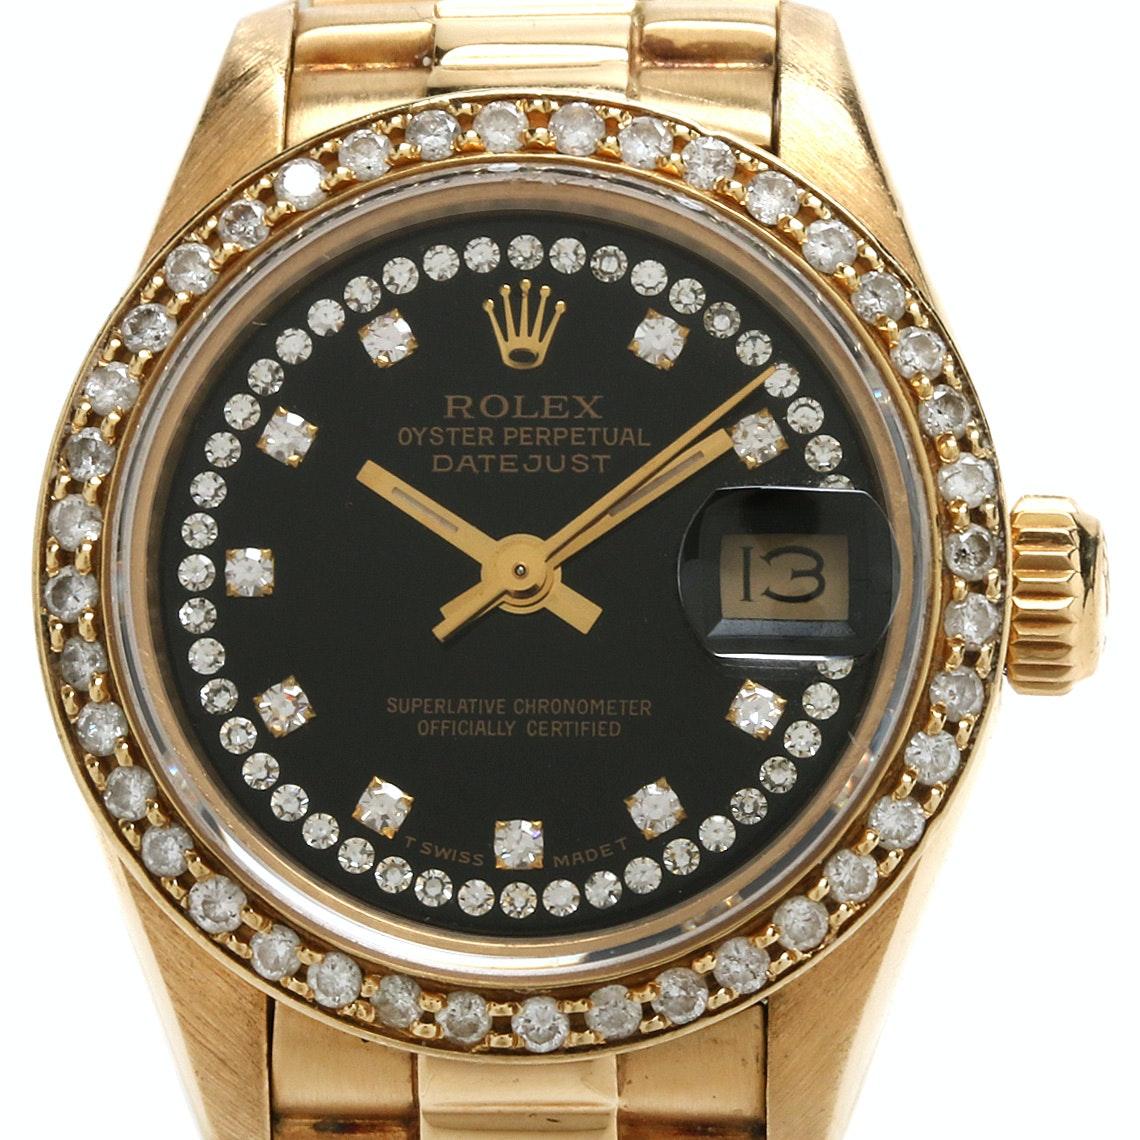 Circa 1990 Rolex President 18K Yellow Gold Diamond Automatic Wristwatch